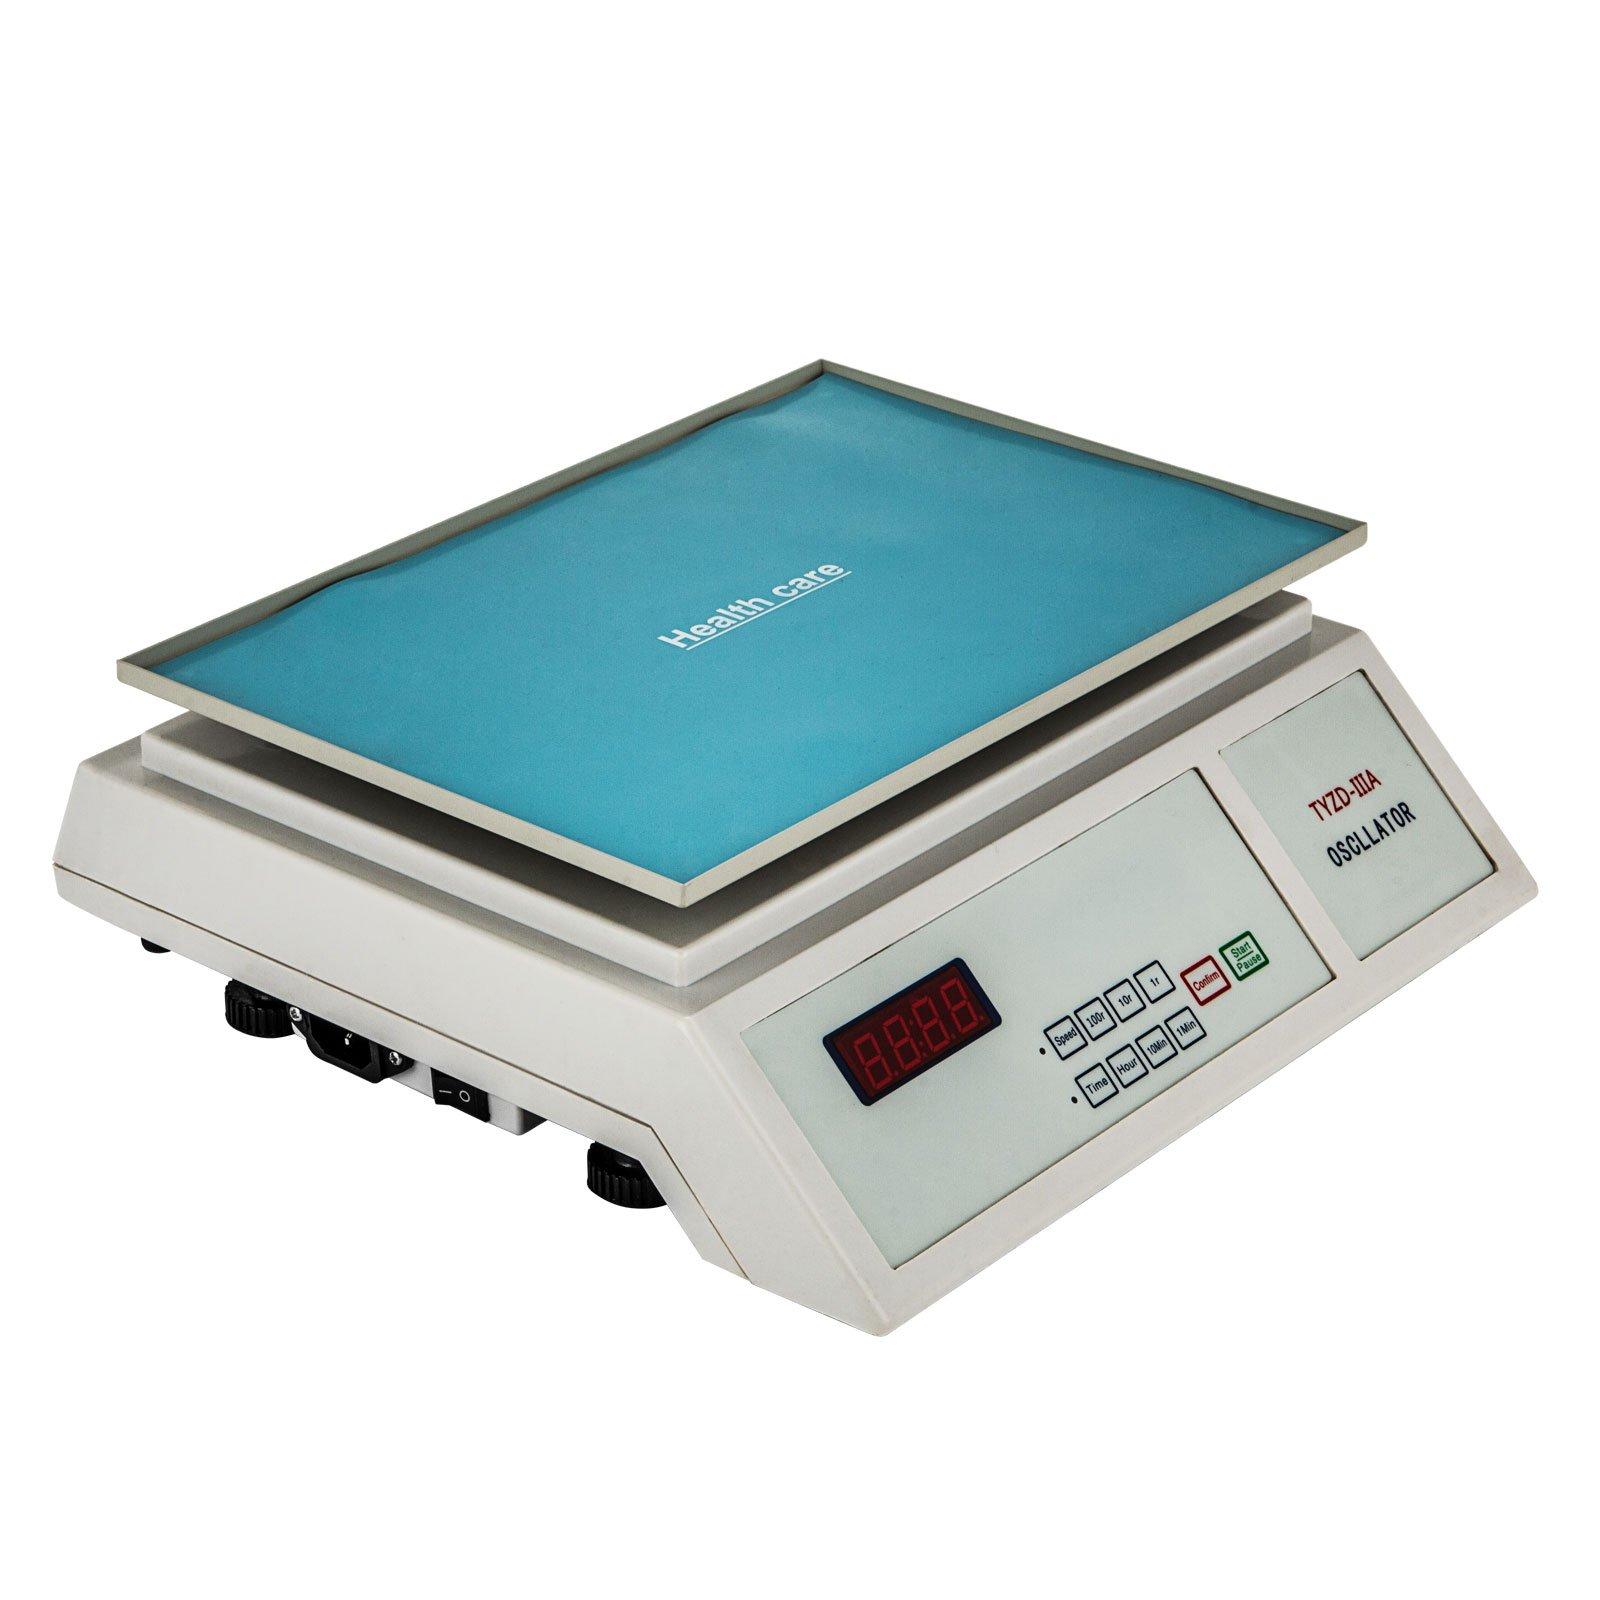 Mophorn Oscillator Orbital Rotator Digital Orbital Shaker Speed Adjustable Lab Oscillator Rotator Biochemical by Mophorn